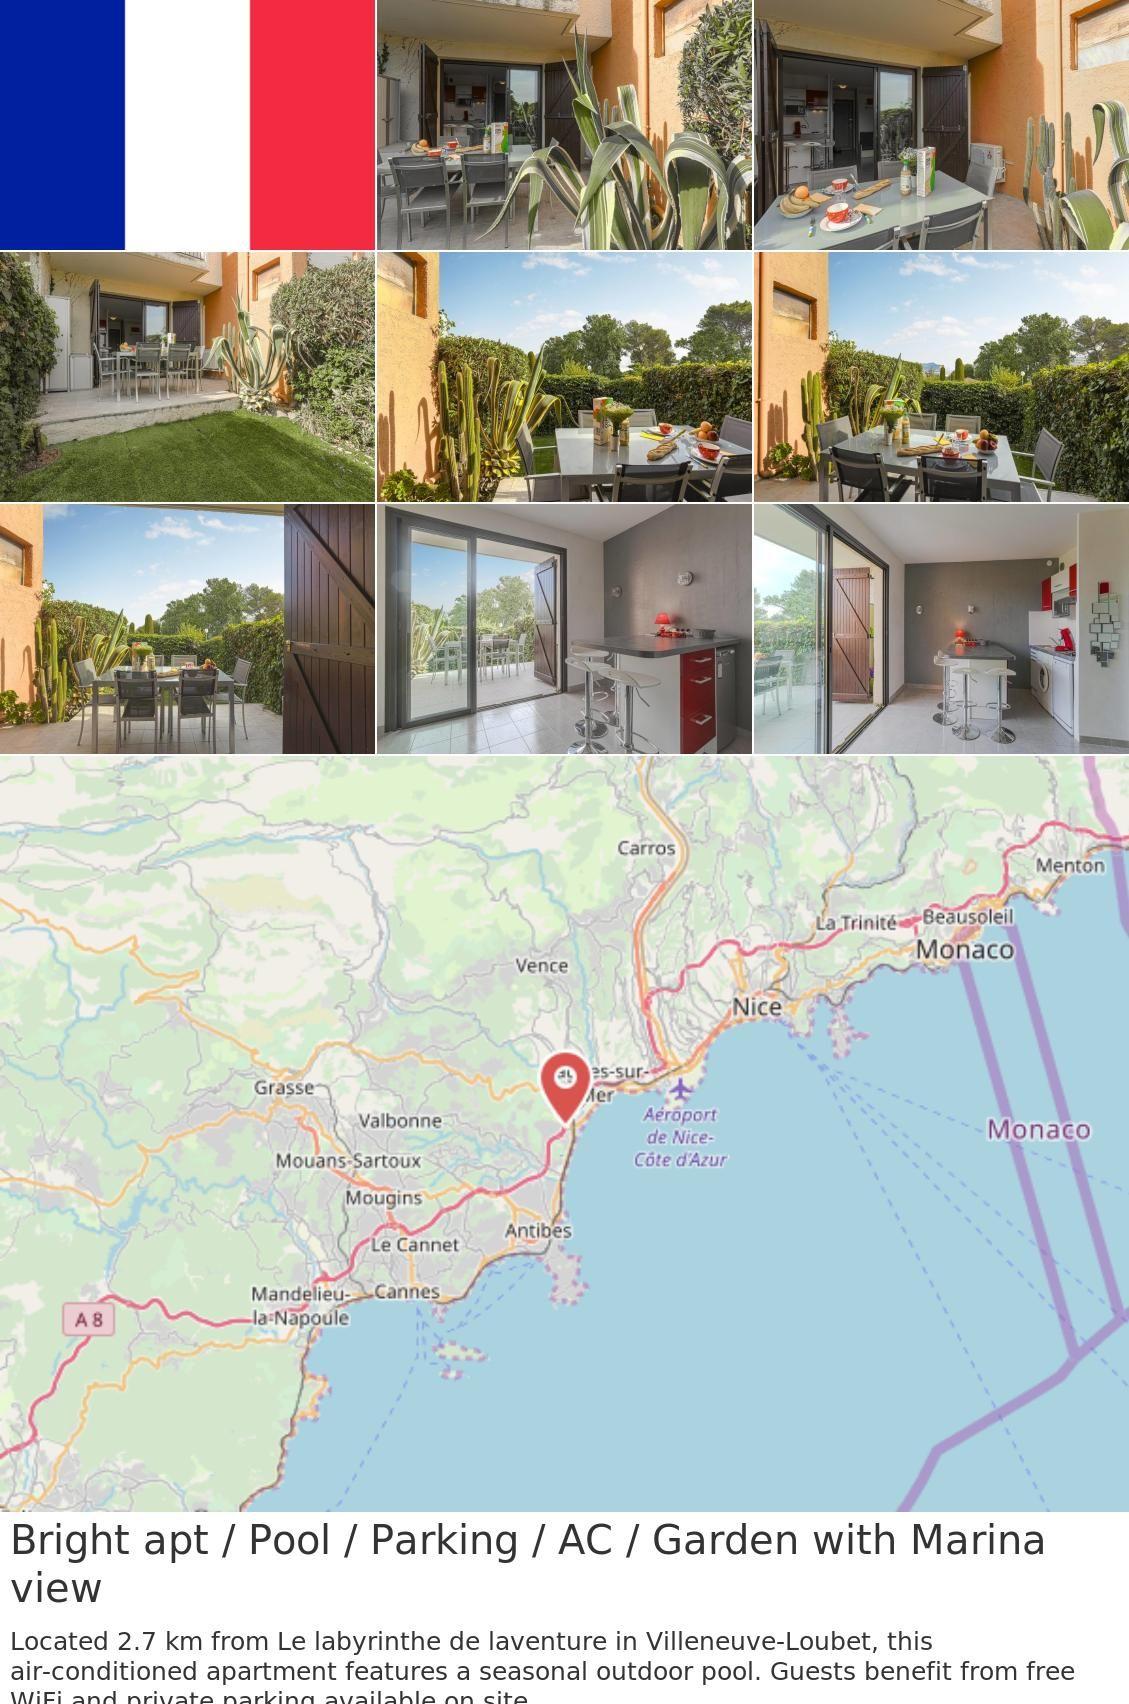 Apt France Map.Europe France Villeneuve Loubet Bright Apt Pool Parking Ac